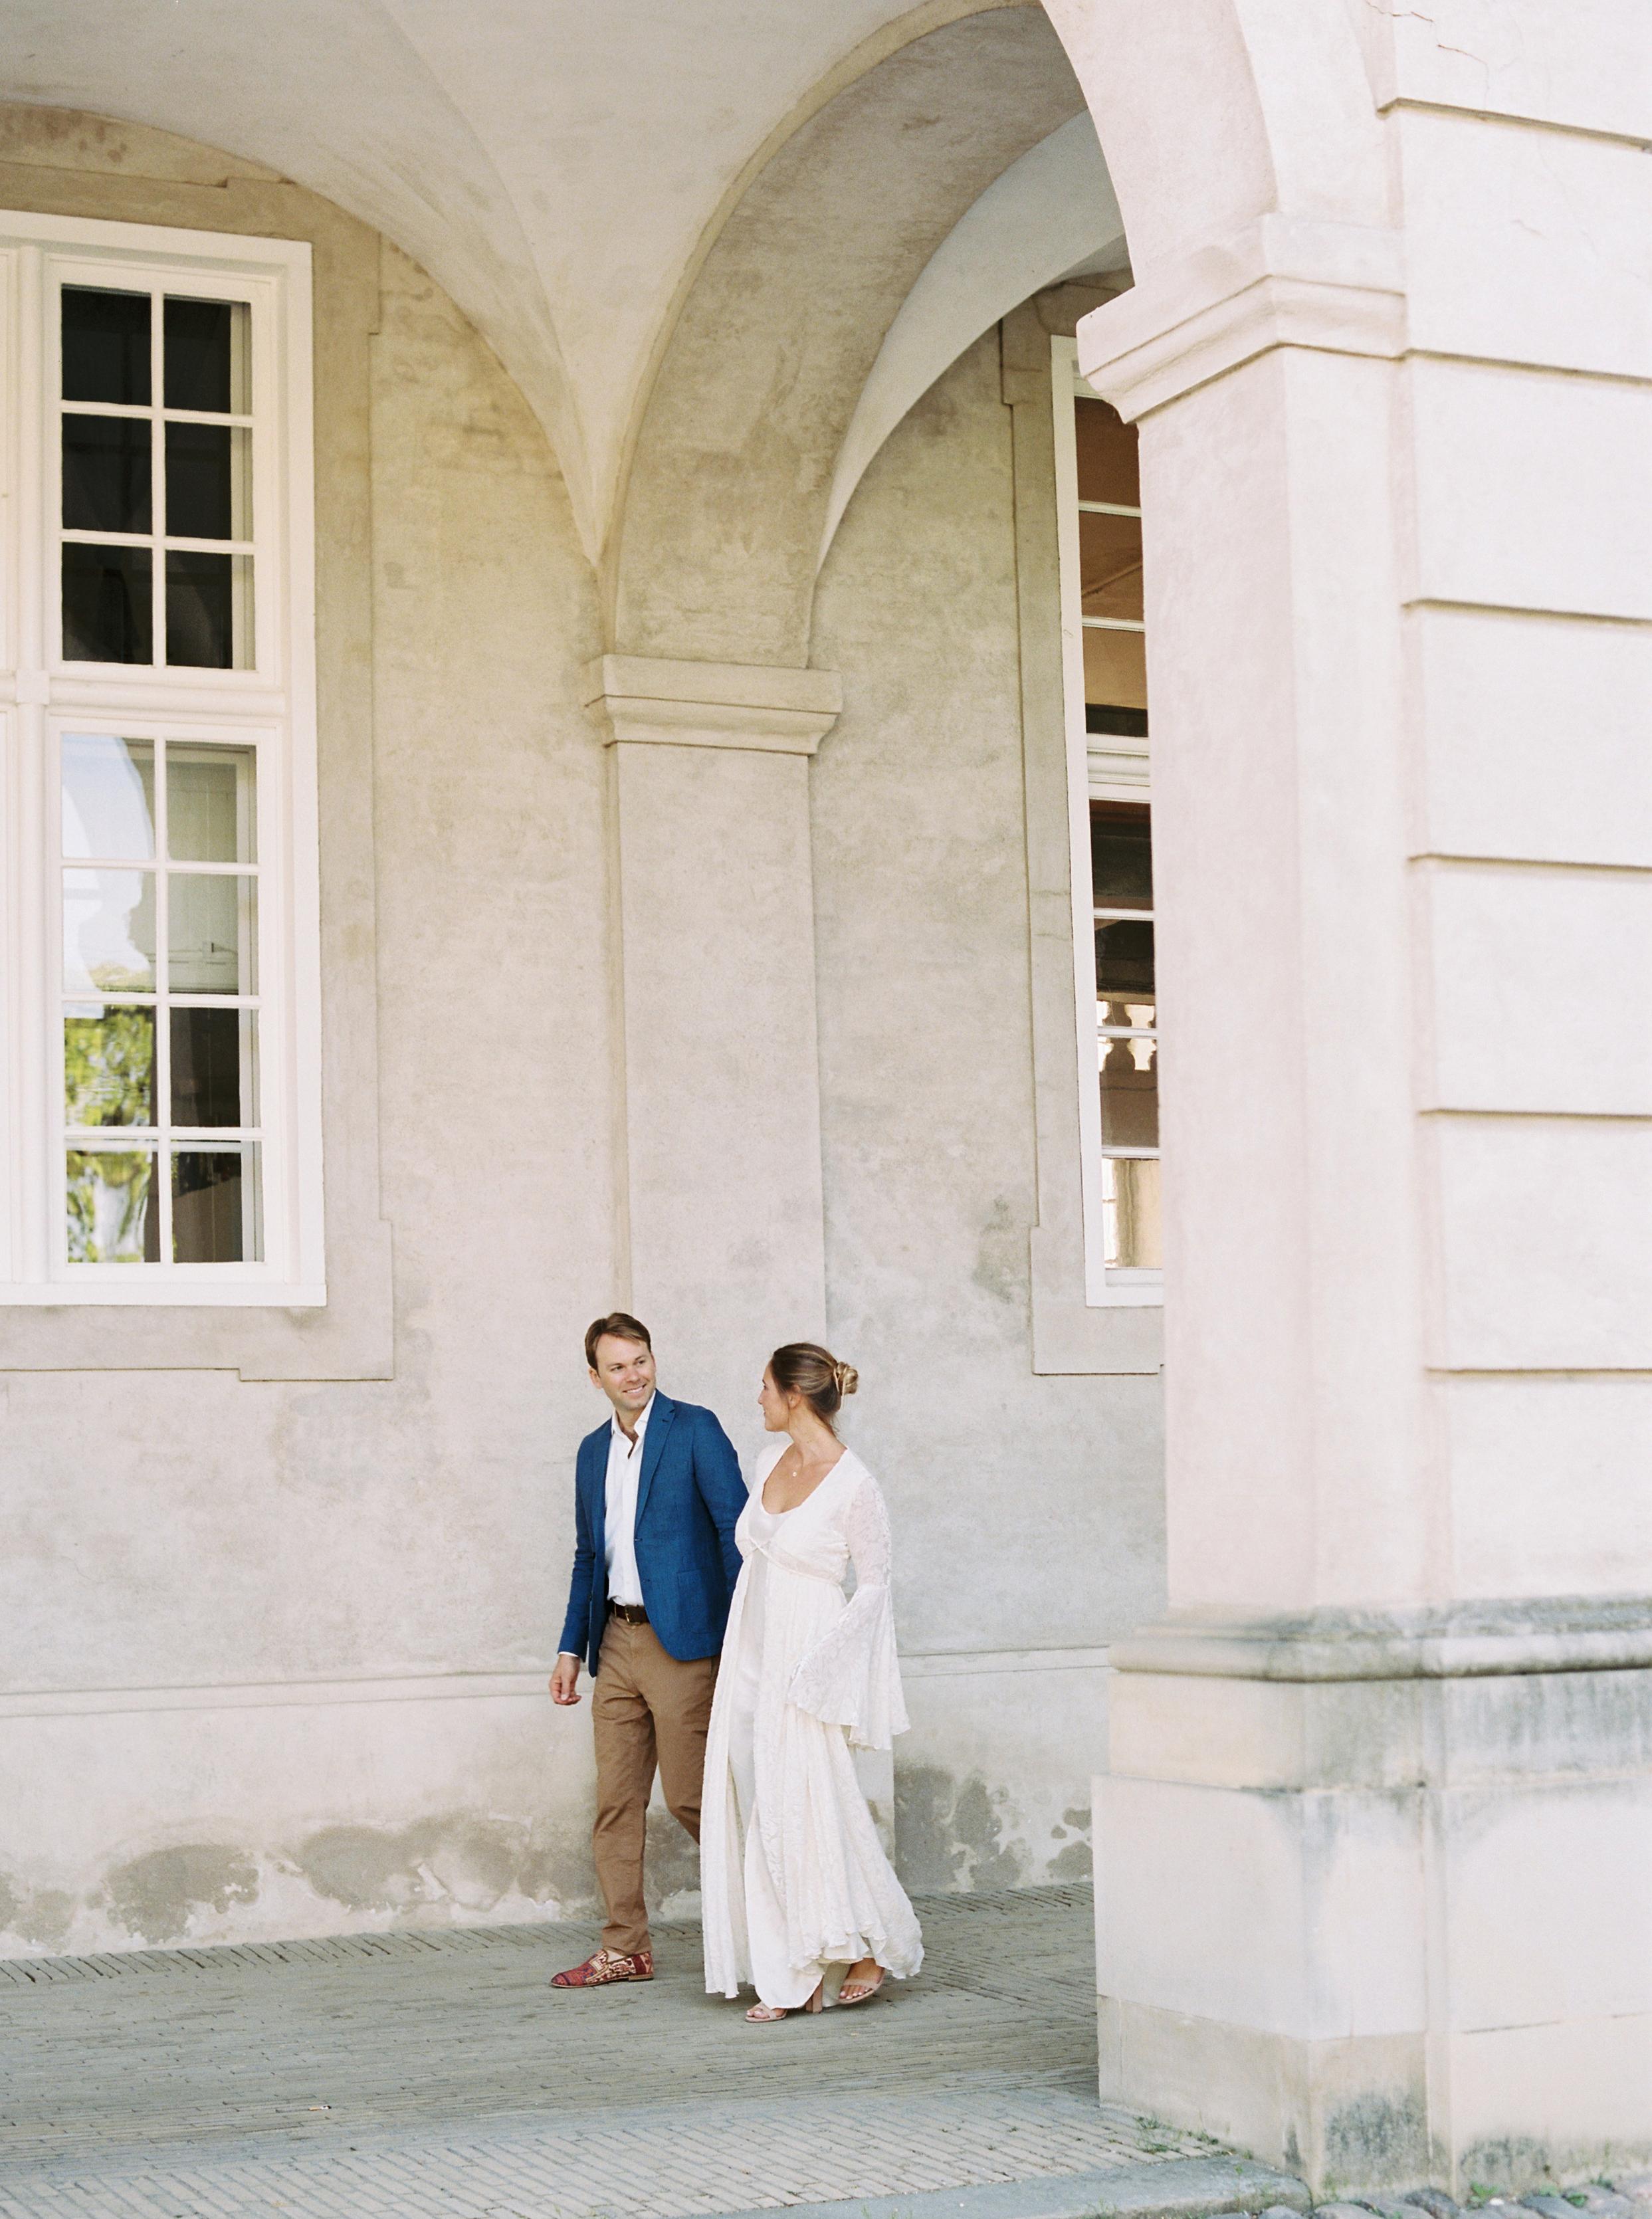 Kyle John l Fine Art Wedding Photography l Chicago, Copenhagen, California, New York, Destination l Blog l Alexis and Zach_Copenhagen Part 2_3